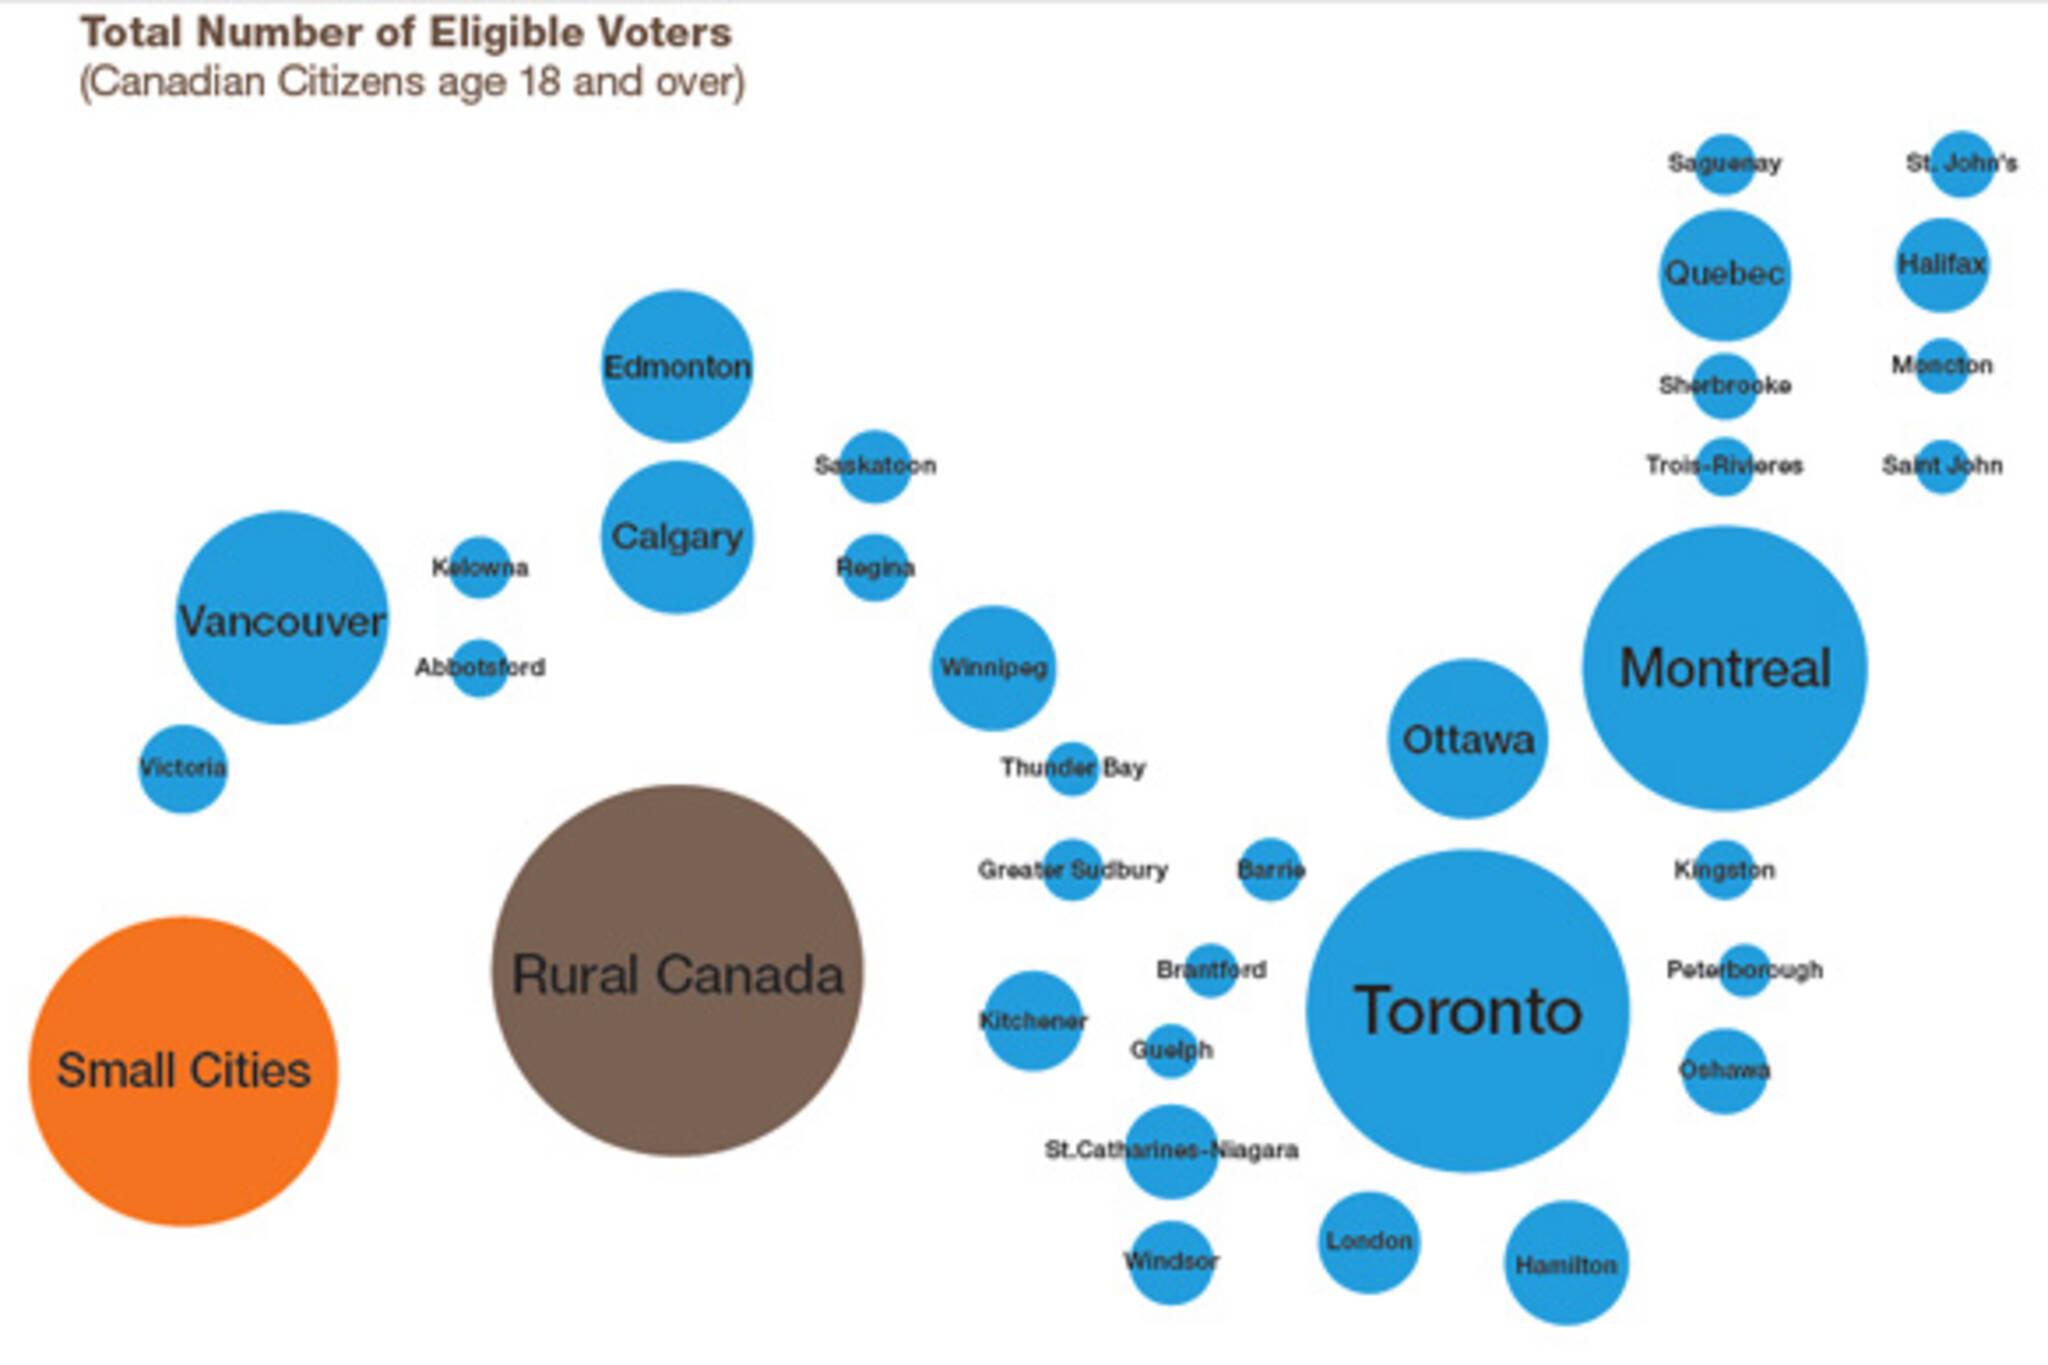 Cities Federal Election Canada Fair